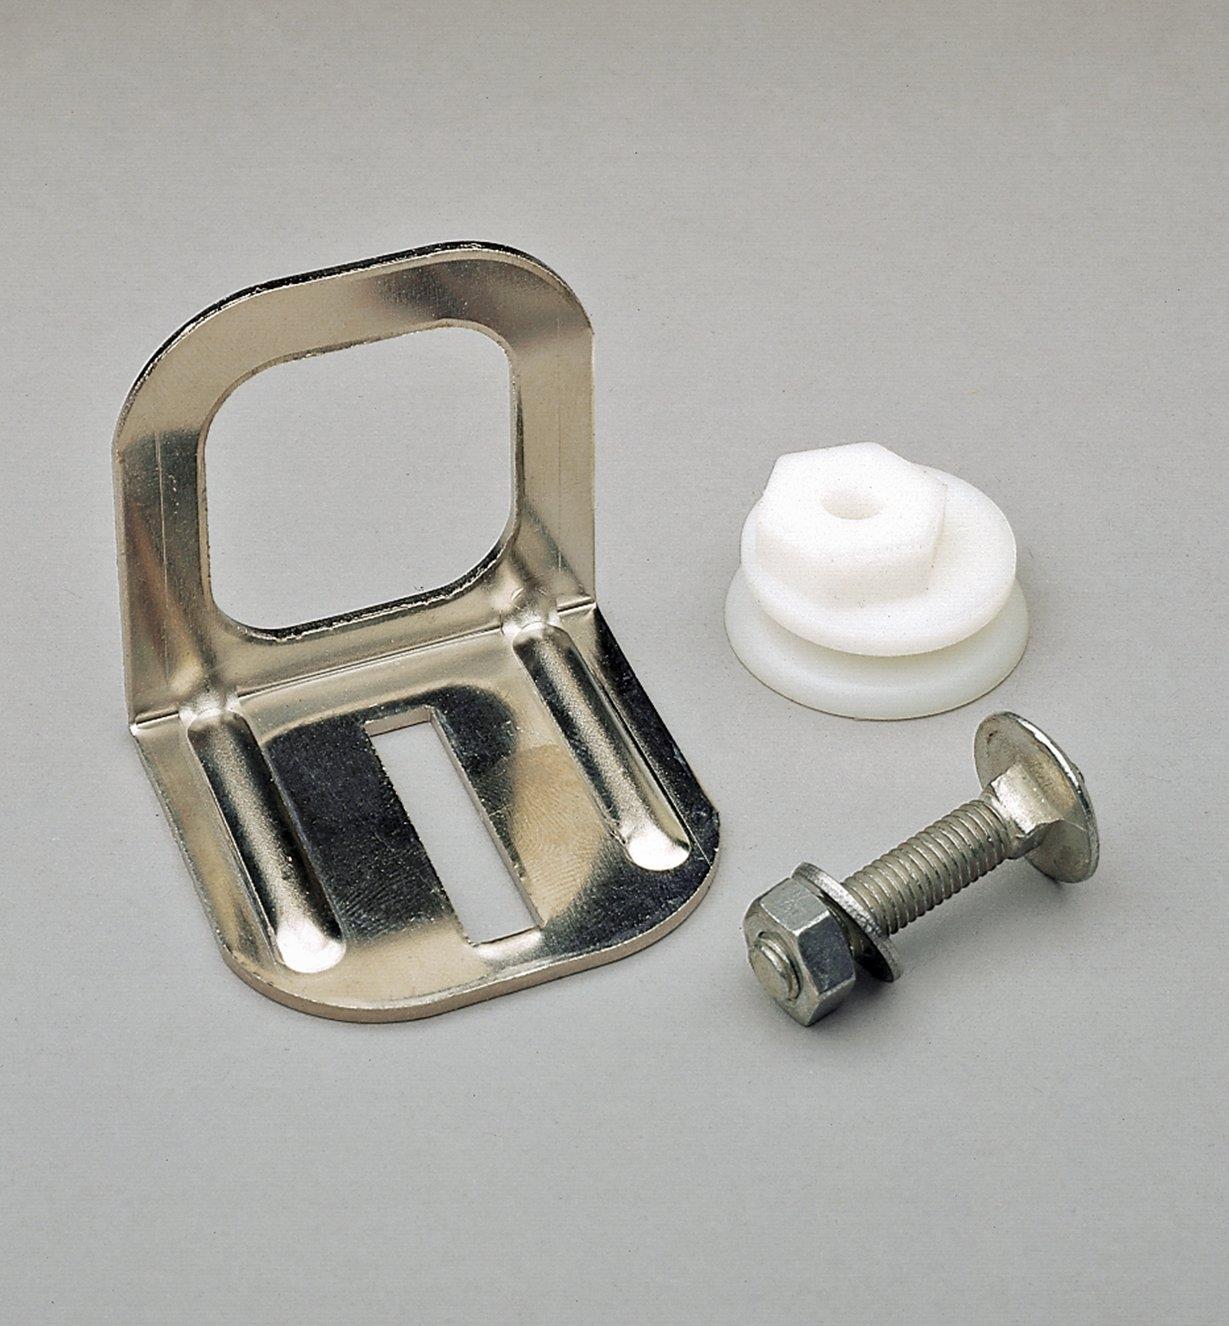 01L0601 - Cabinet Hangers, pr.